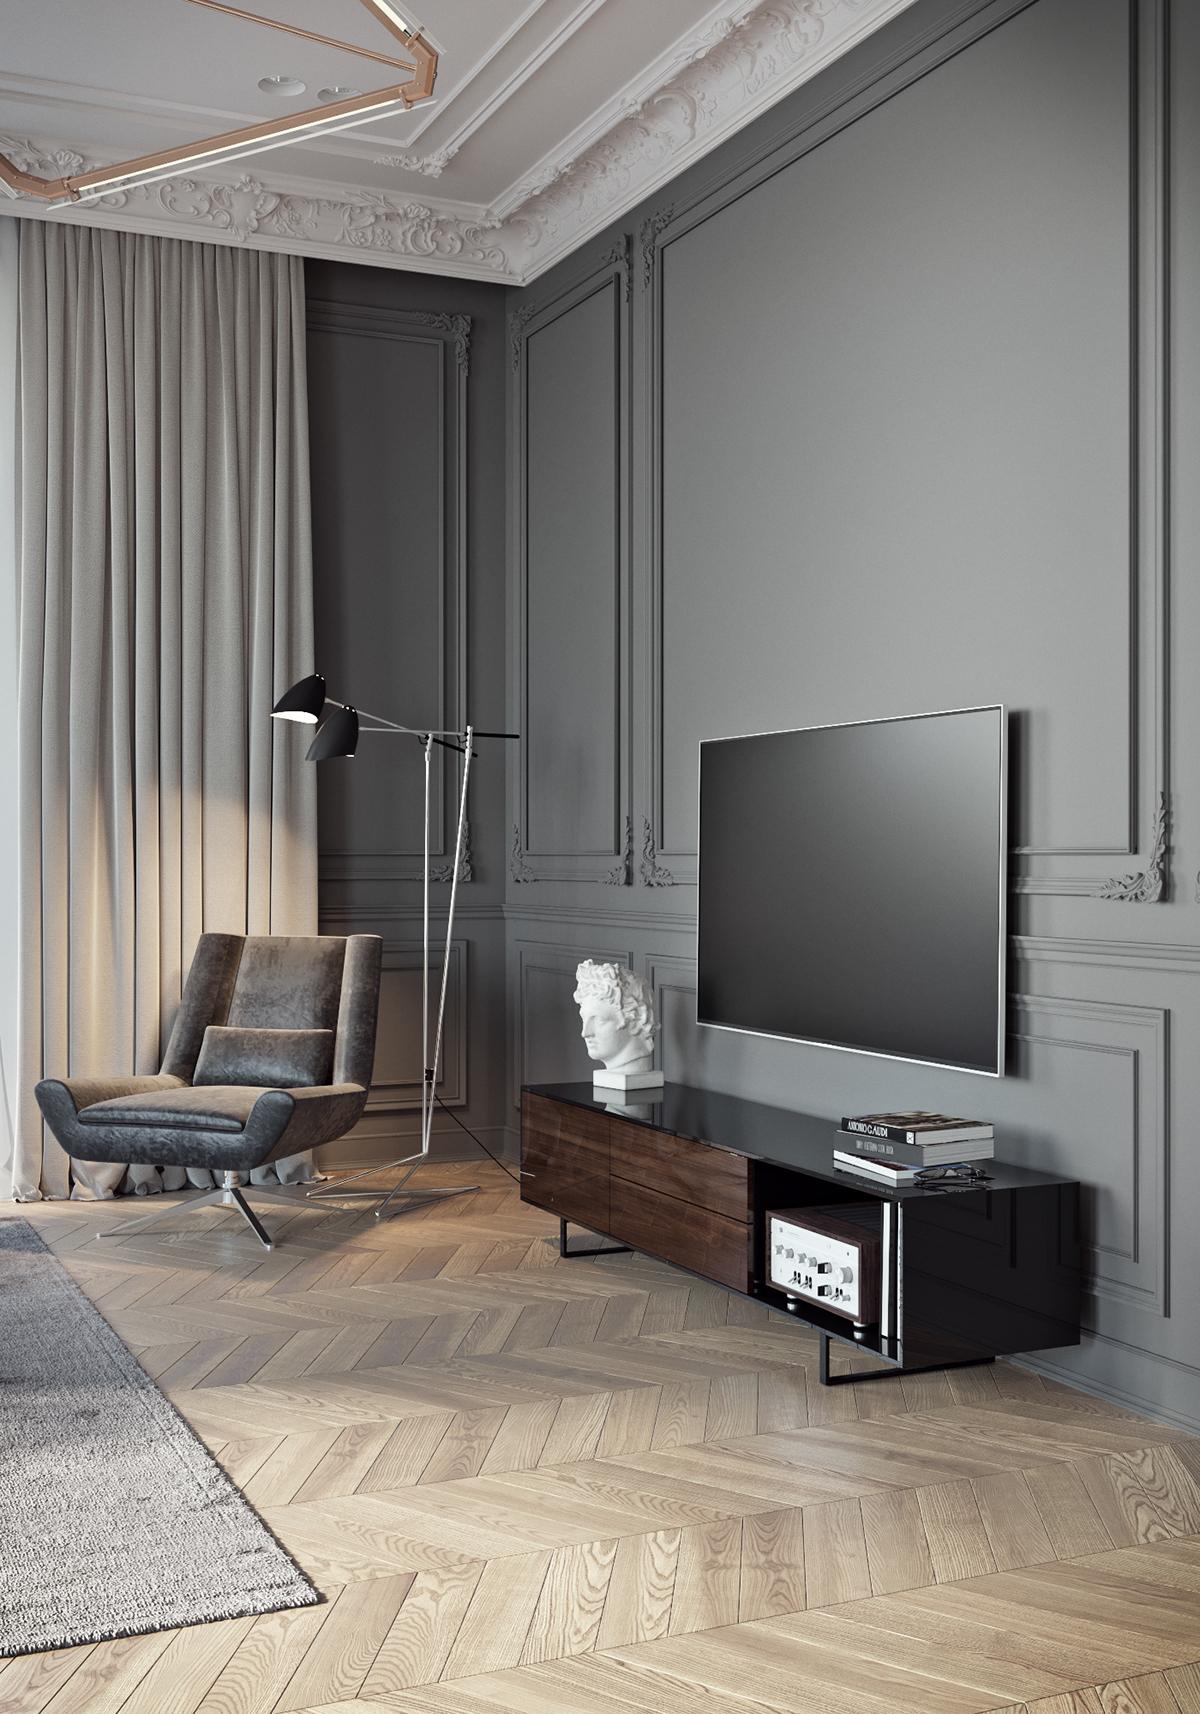 architecture,Interior,design,tolko,Classic,luxury,modern,Lux,apartment,flat